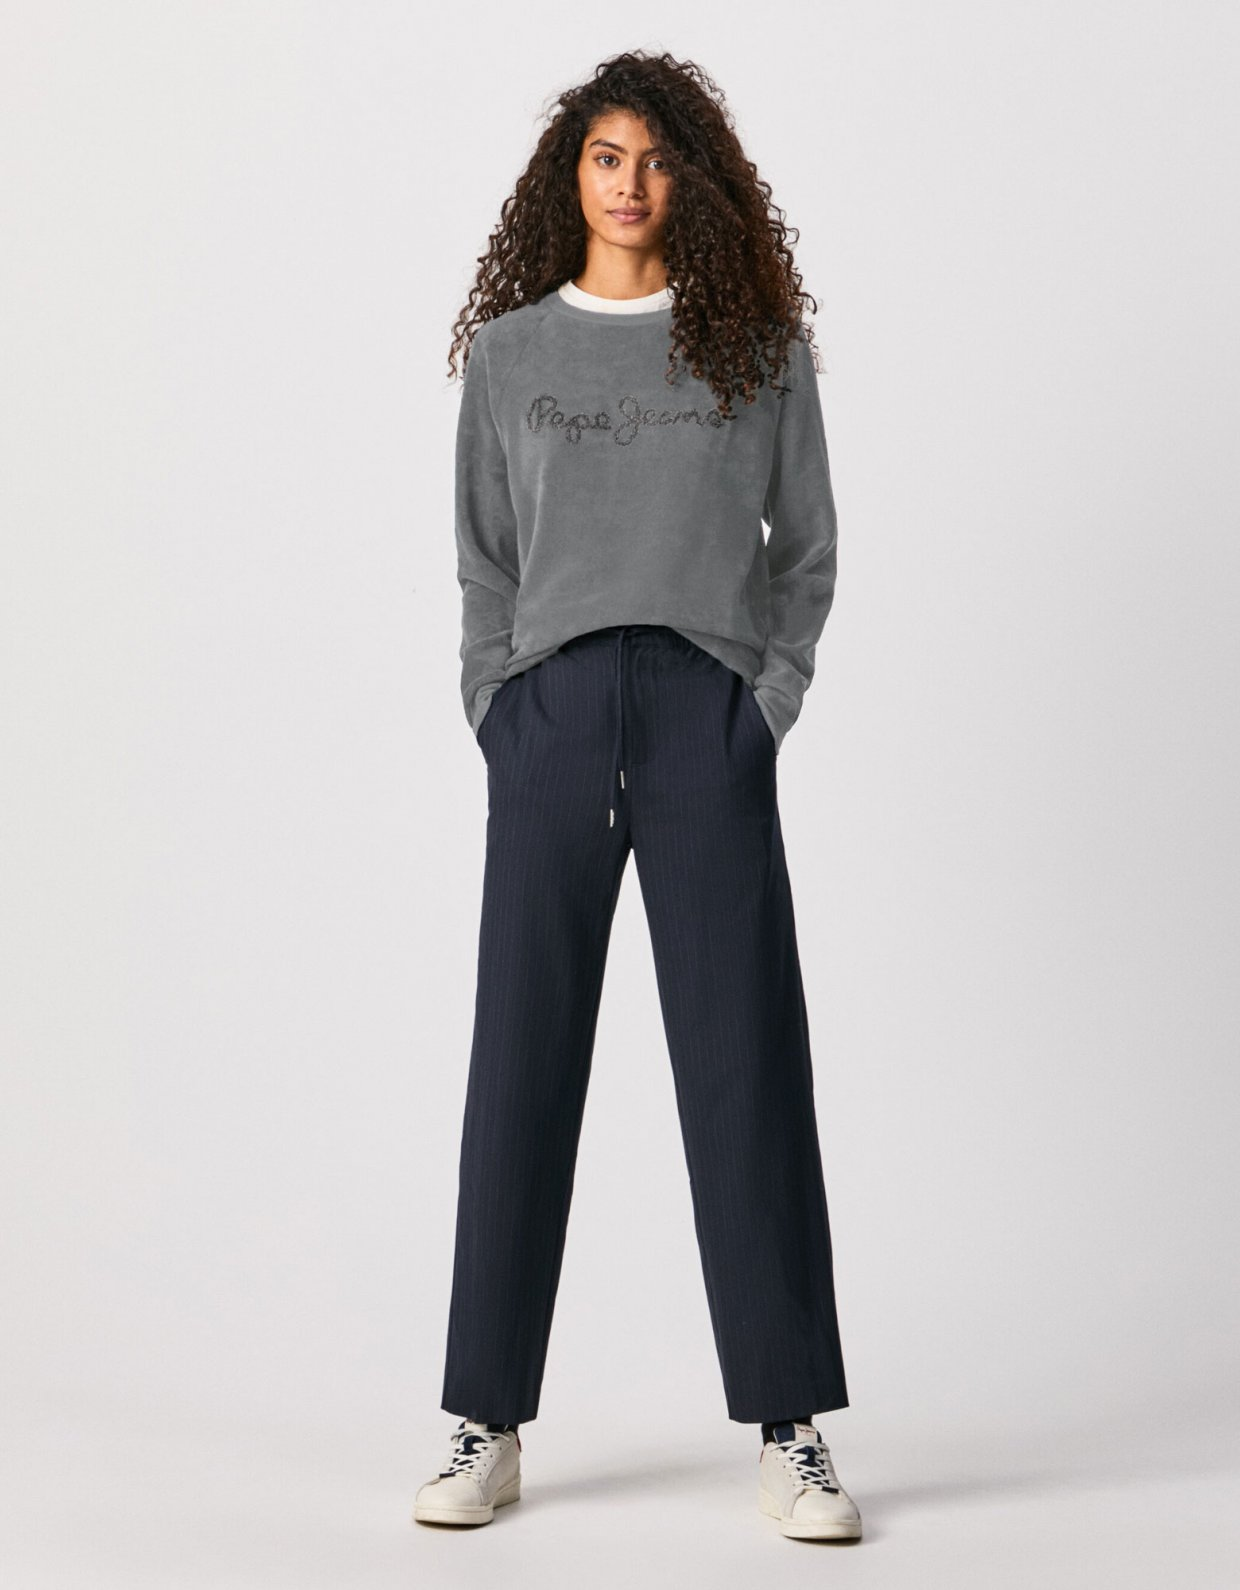 Pepe Jeans Nana sweatshirt grey marl